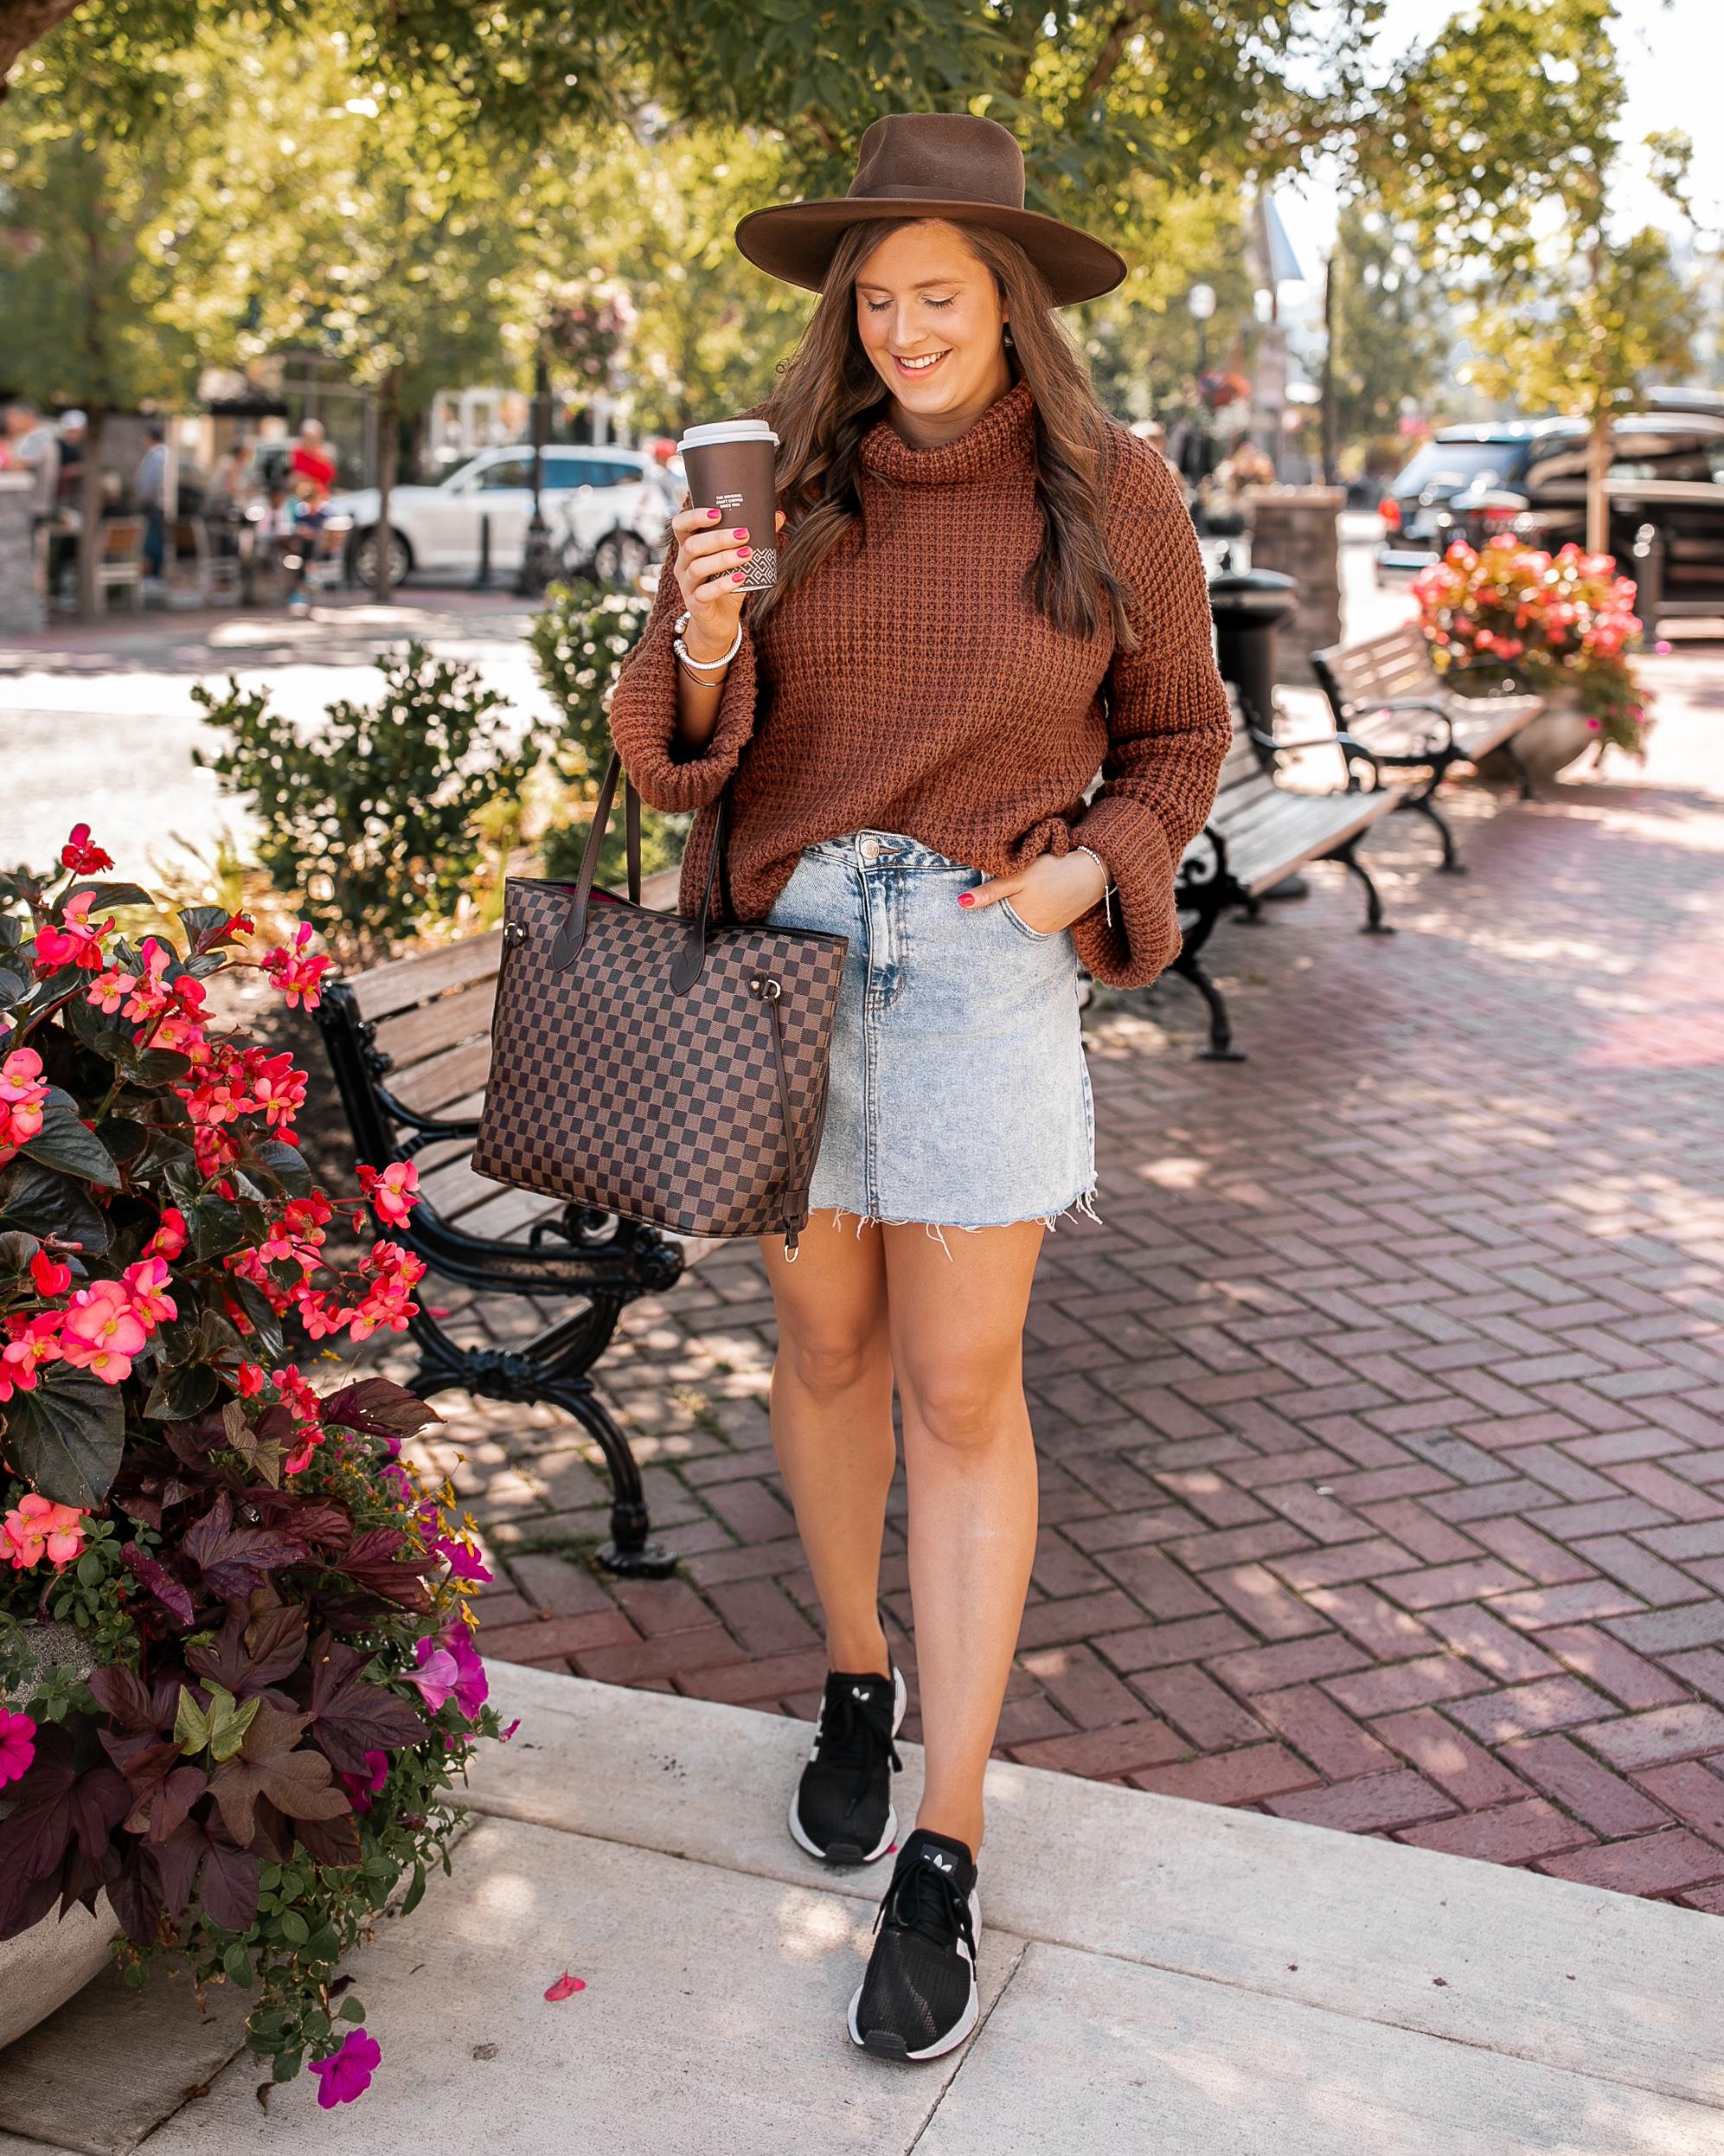 Denim Mini Skirt Athleisure Outfit @stylebyjulianne